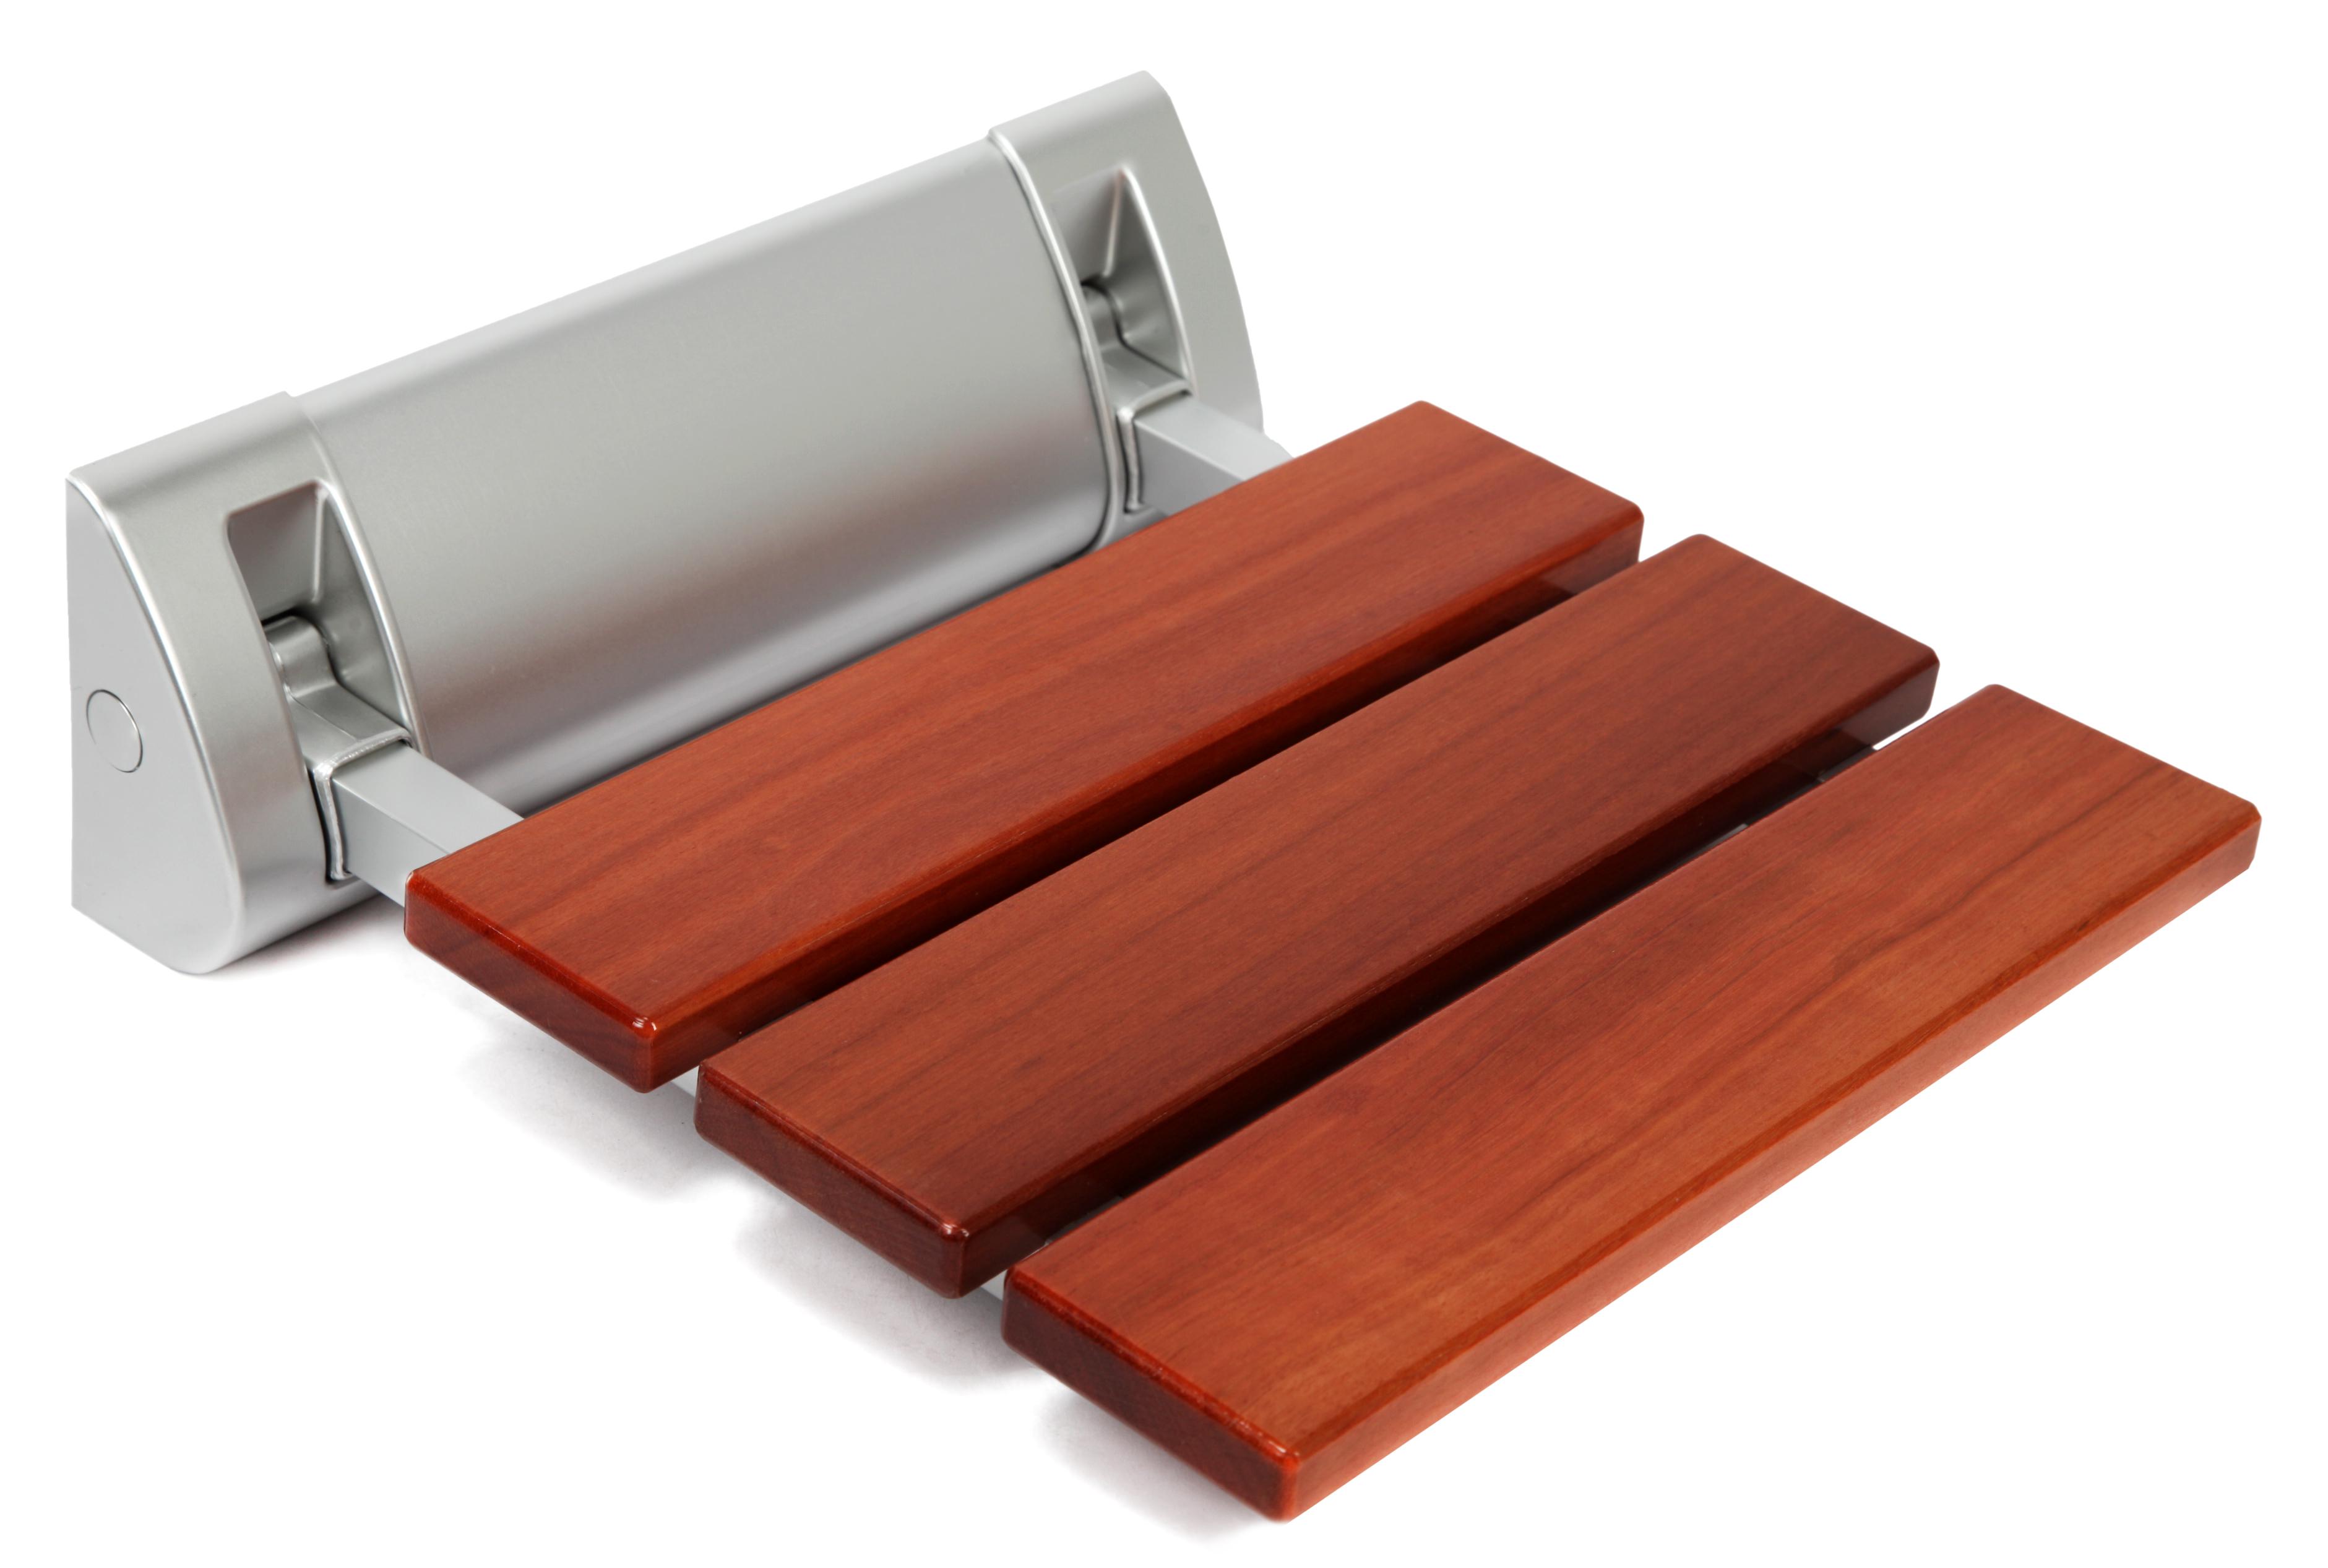 kenley wandmontage holz duschklappsitz klappbar duschsitz klappsitz dusche 150kg ebay. Black Bedroom Furniture Sets. Home Design Ideas